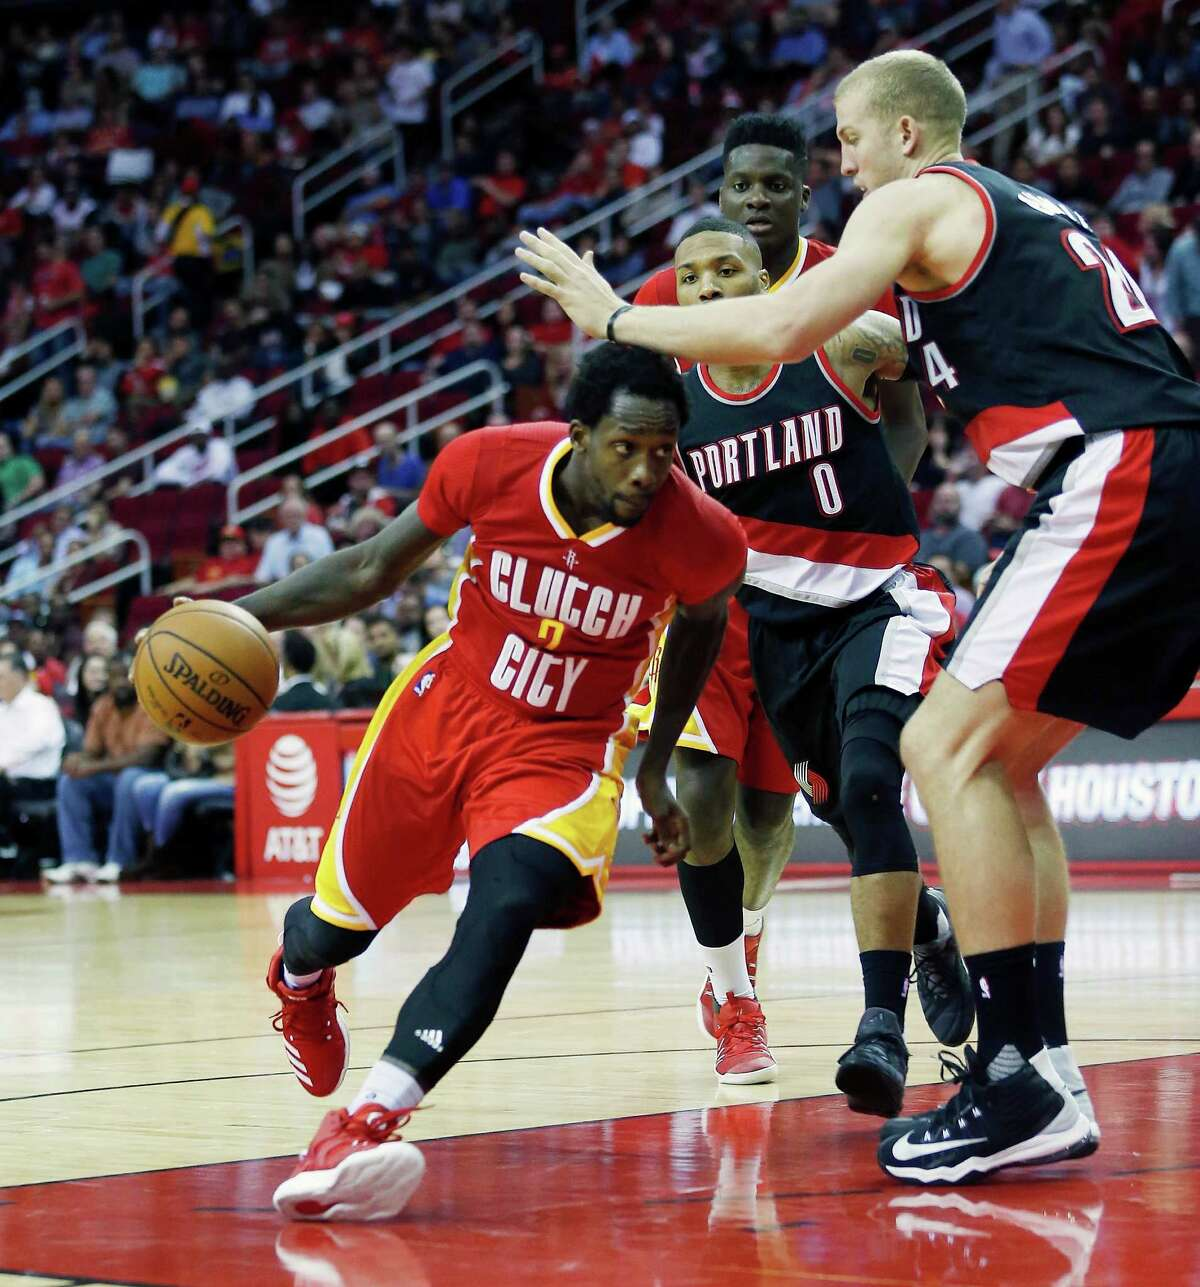 Houston Rockets guard Patrick Beverley (2) drives around Portland Trail Blazers guard Damian Lillard (0) and forward Mason Plumlee (24) in the second half of an NBA basketball game on Thursday, Nov. 17, 2016, in Houston. (AP Photo/Bob Levey)